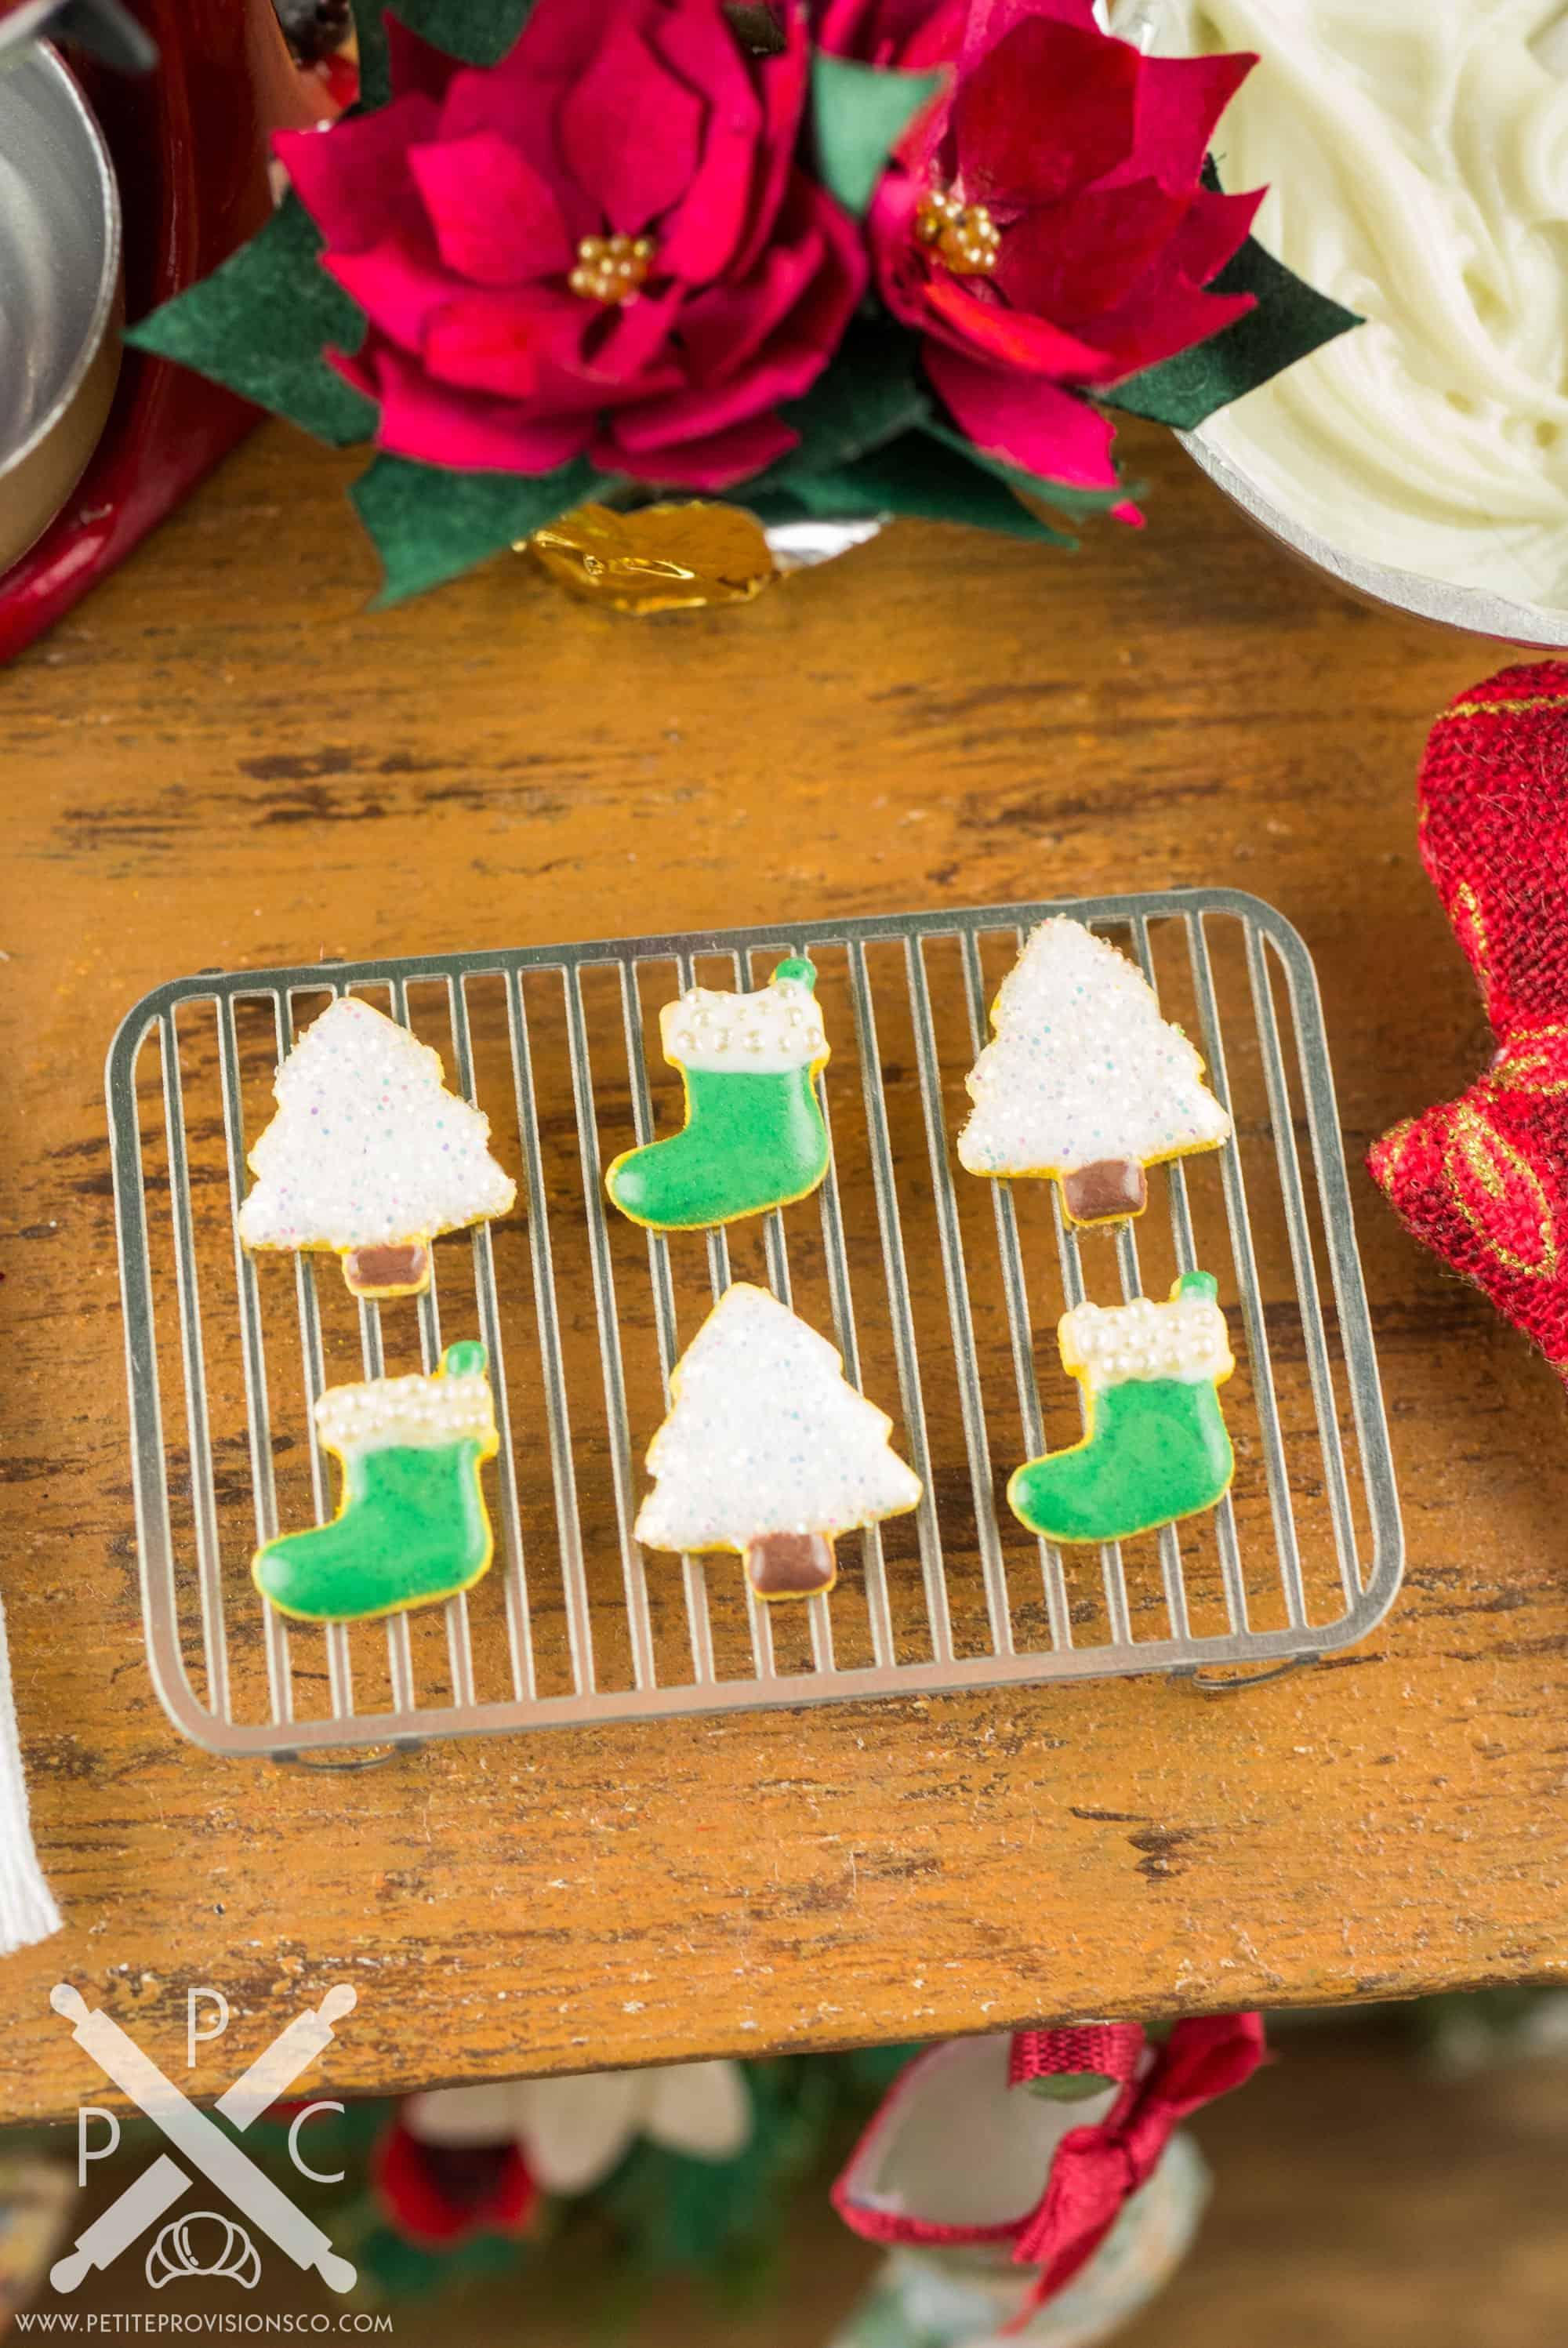 Dollhouse Miniature Christmas Trees And Stockings Cookies Half Dozen 1 12 Dollhouse Miniature The Petite Provisions Co